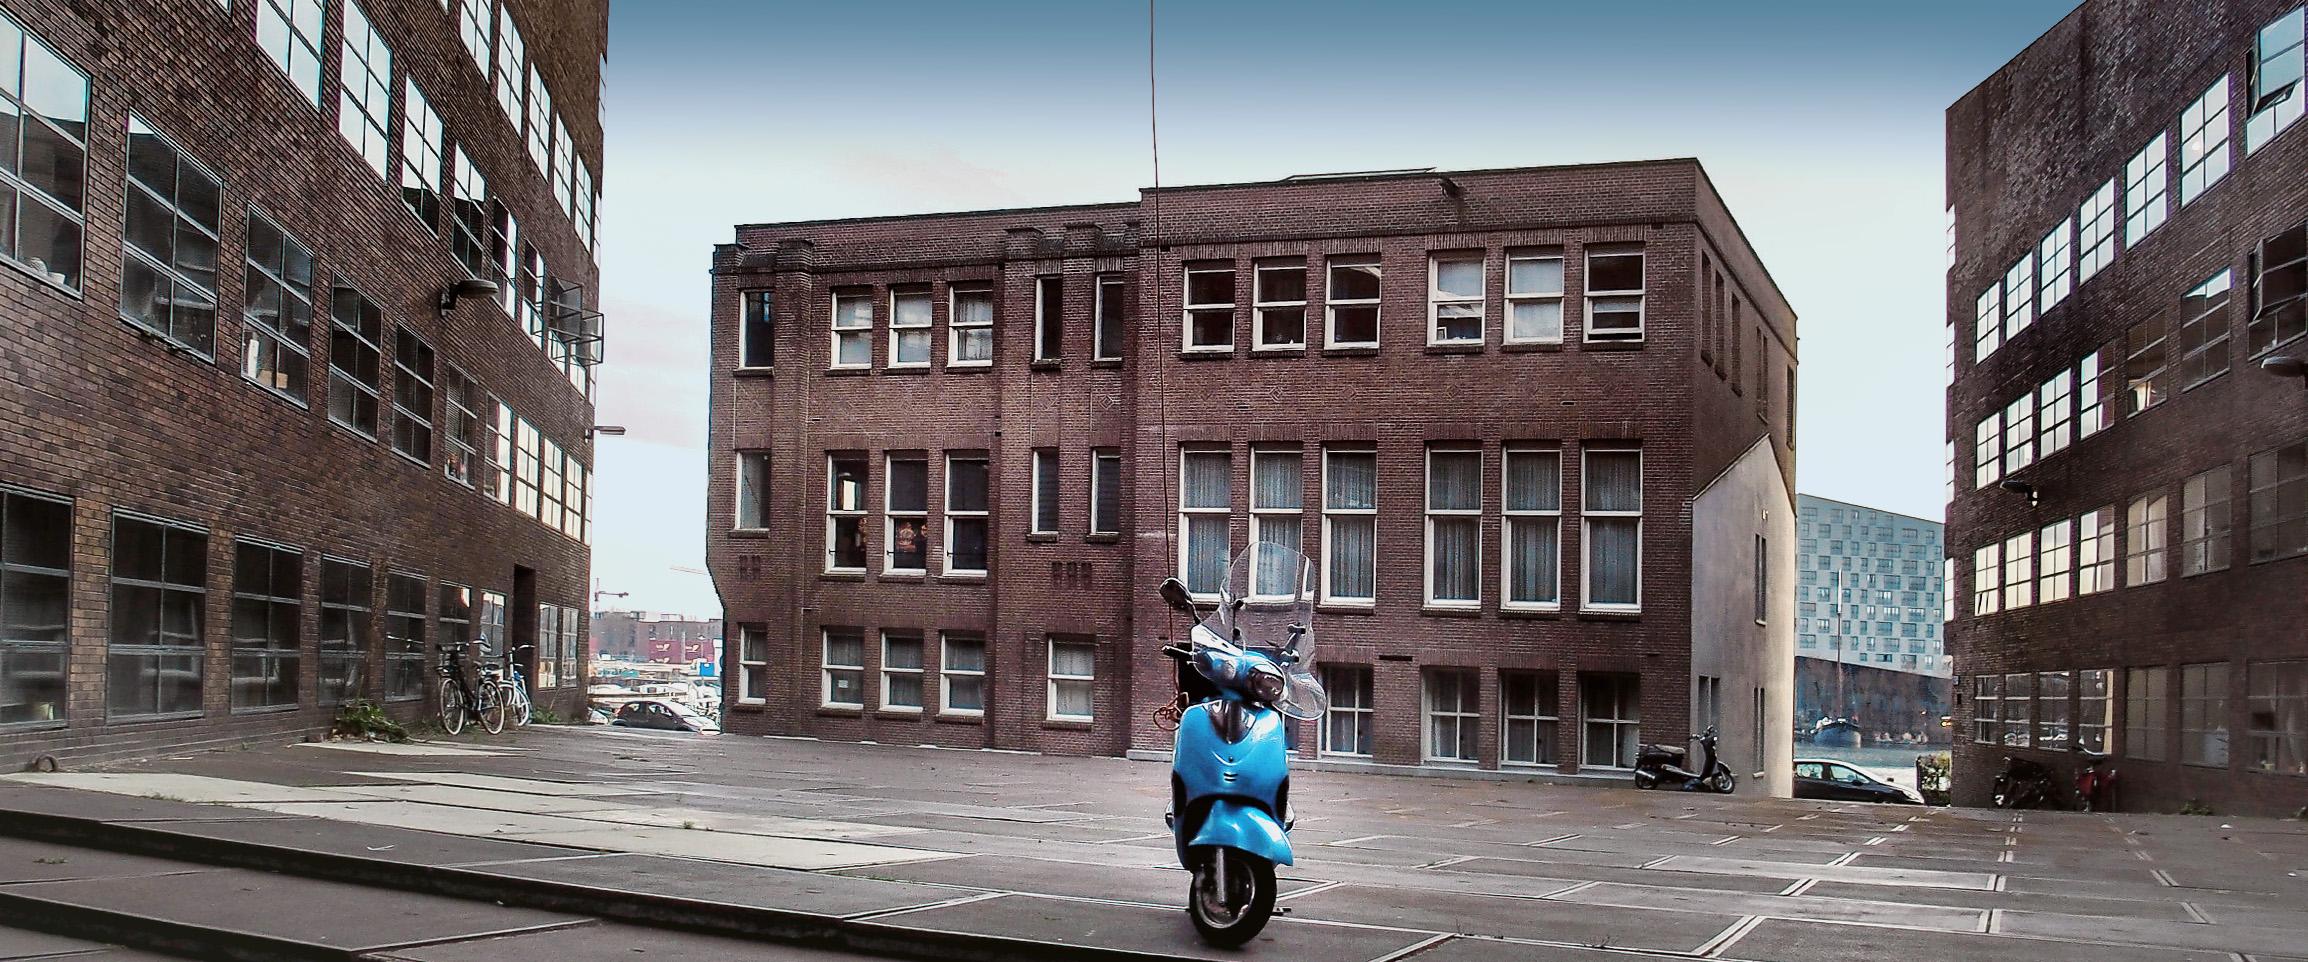 2 Amsterdam moderne Arichtektur fotograf reutlingen